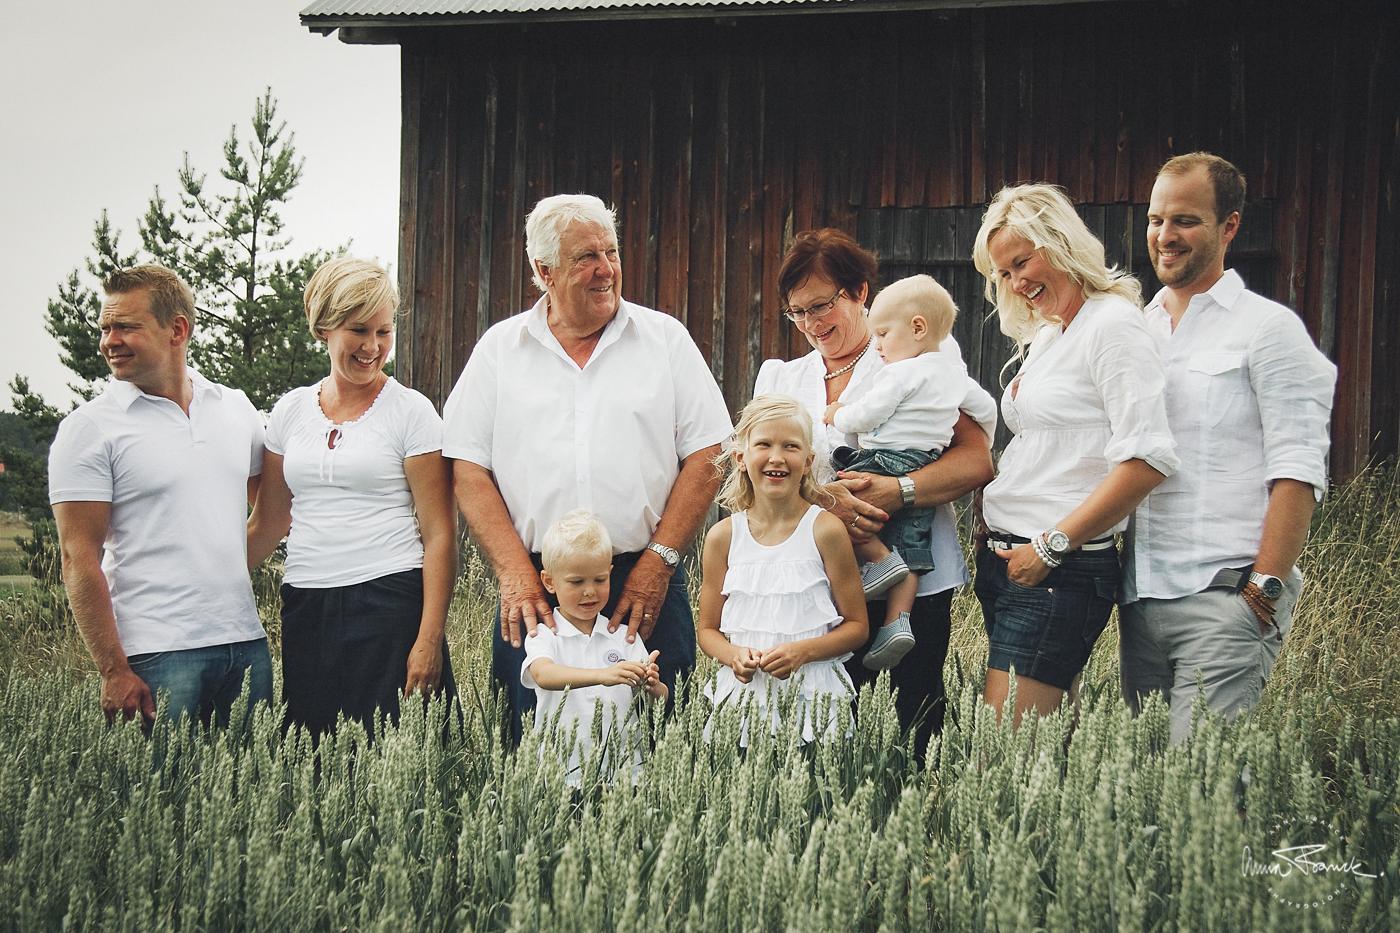 familjefoto, perhekuva, familj, barn, perhe, lapsi, anna, franck, fotograf, valokuvaaja, pargas, parainen, stockholm, natur, maalaiselämä, countryside, lantromantik